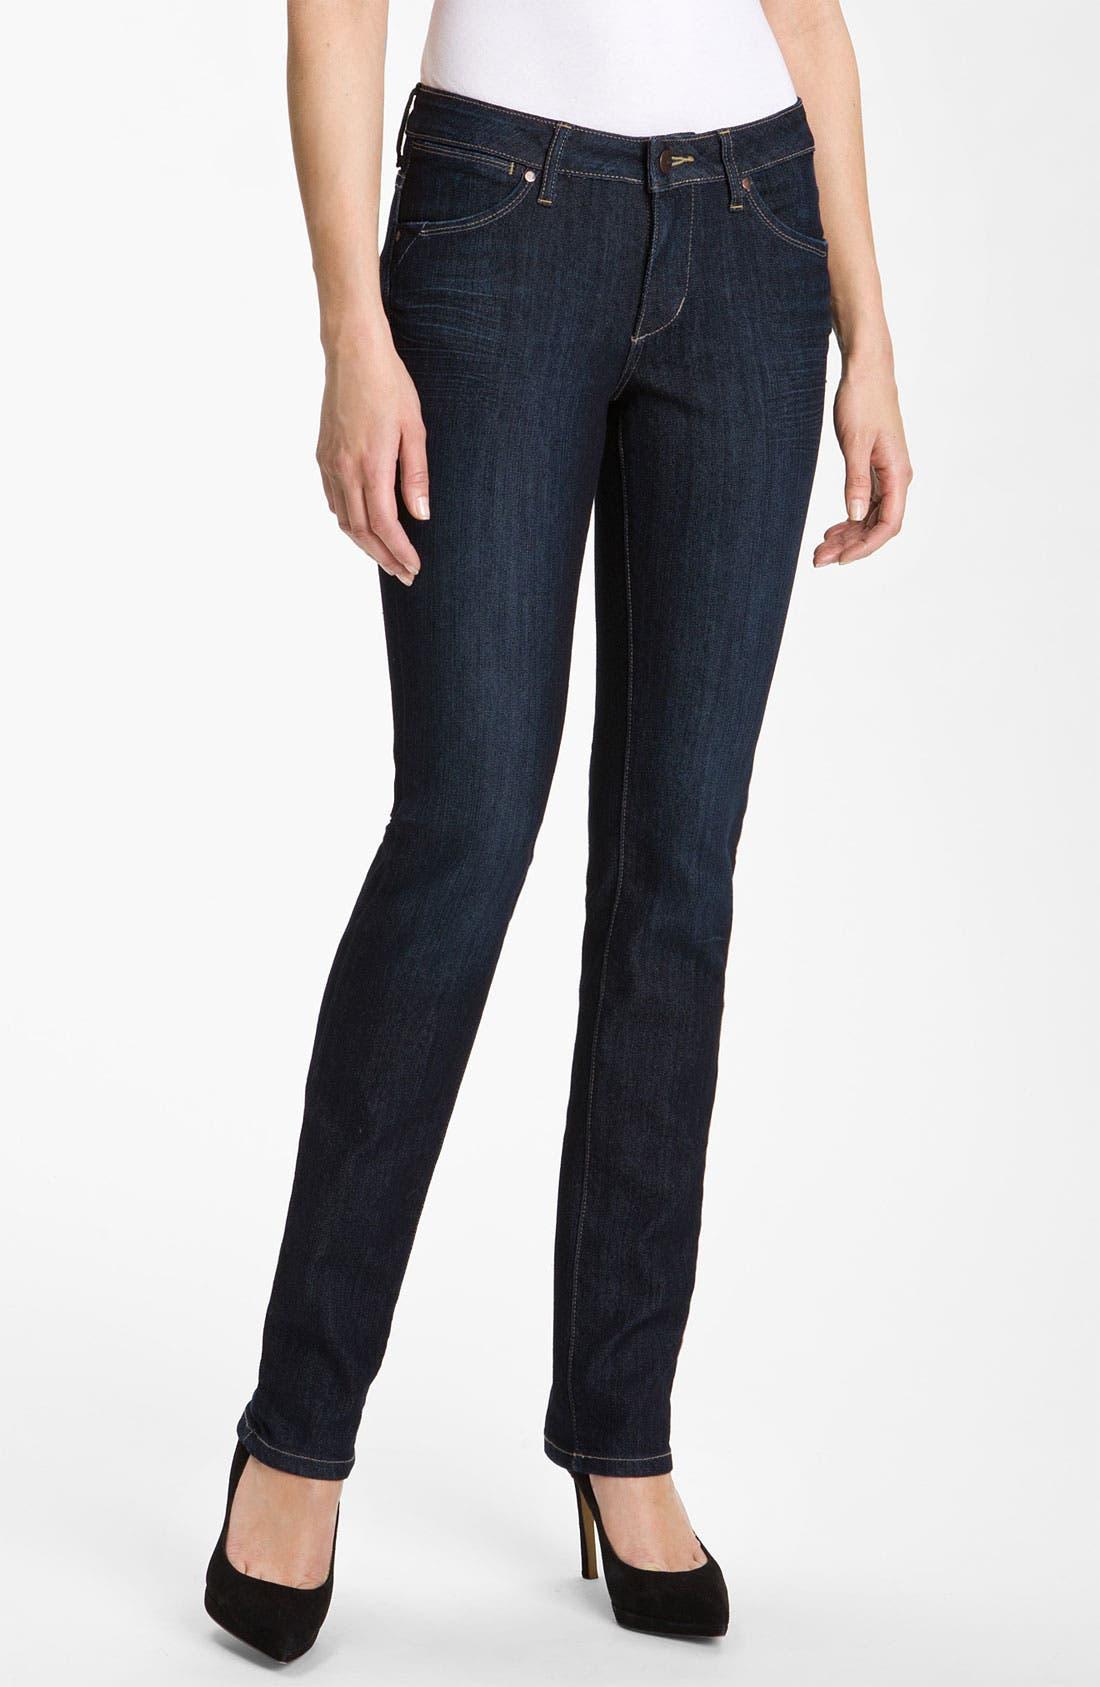 Main Image - Jag Jeans 'New Jane' Slim Leg Jeans (Petite)